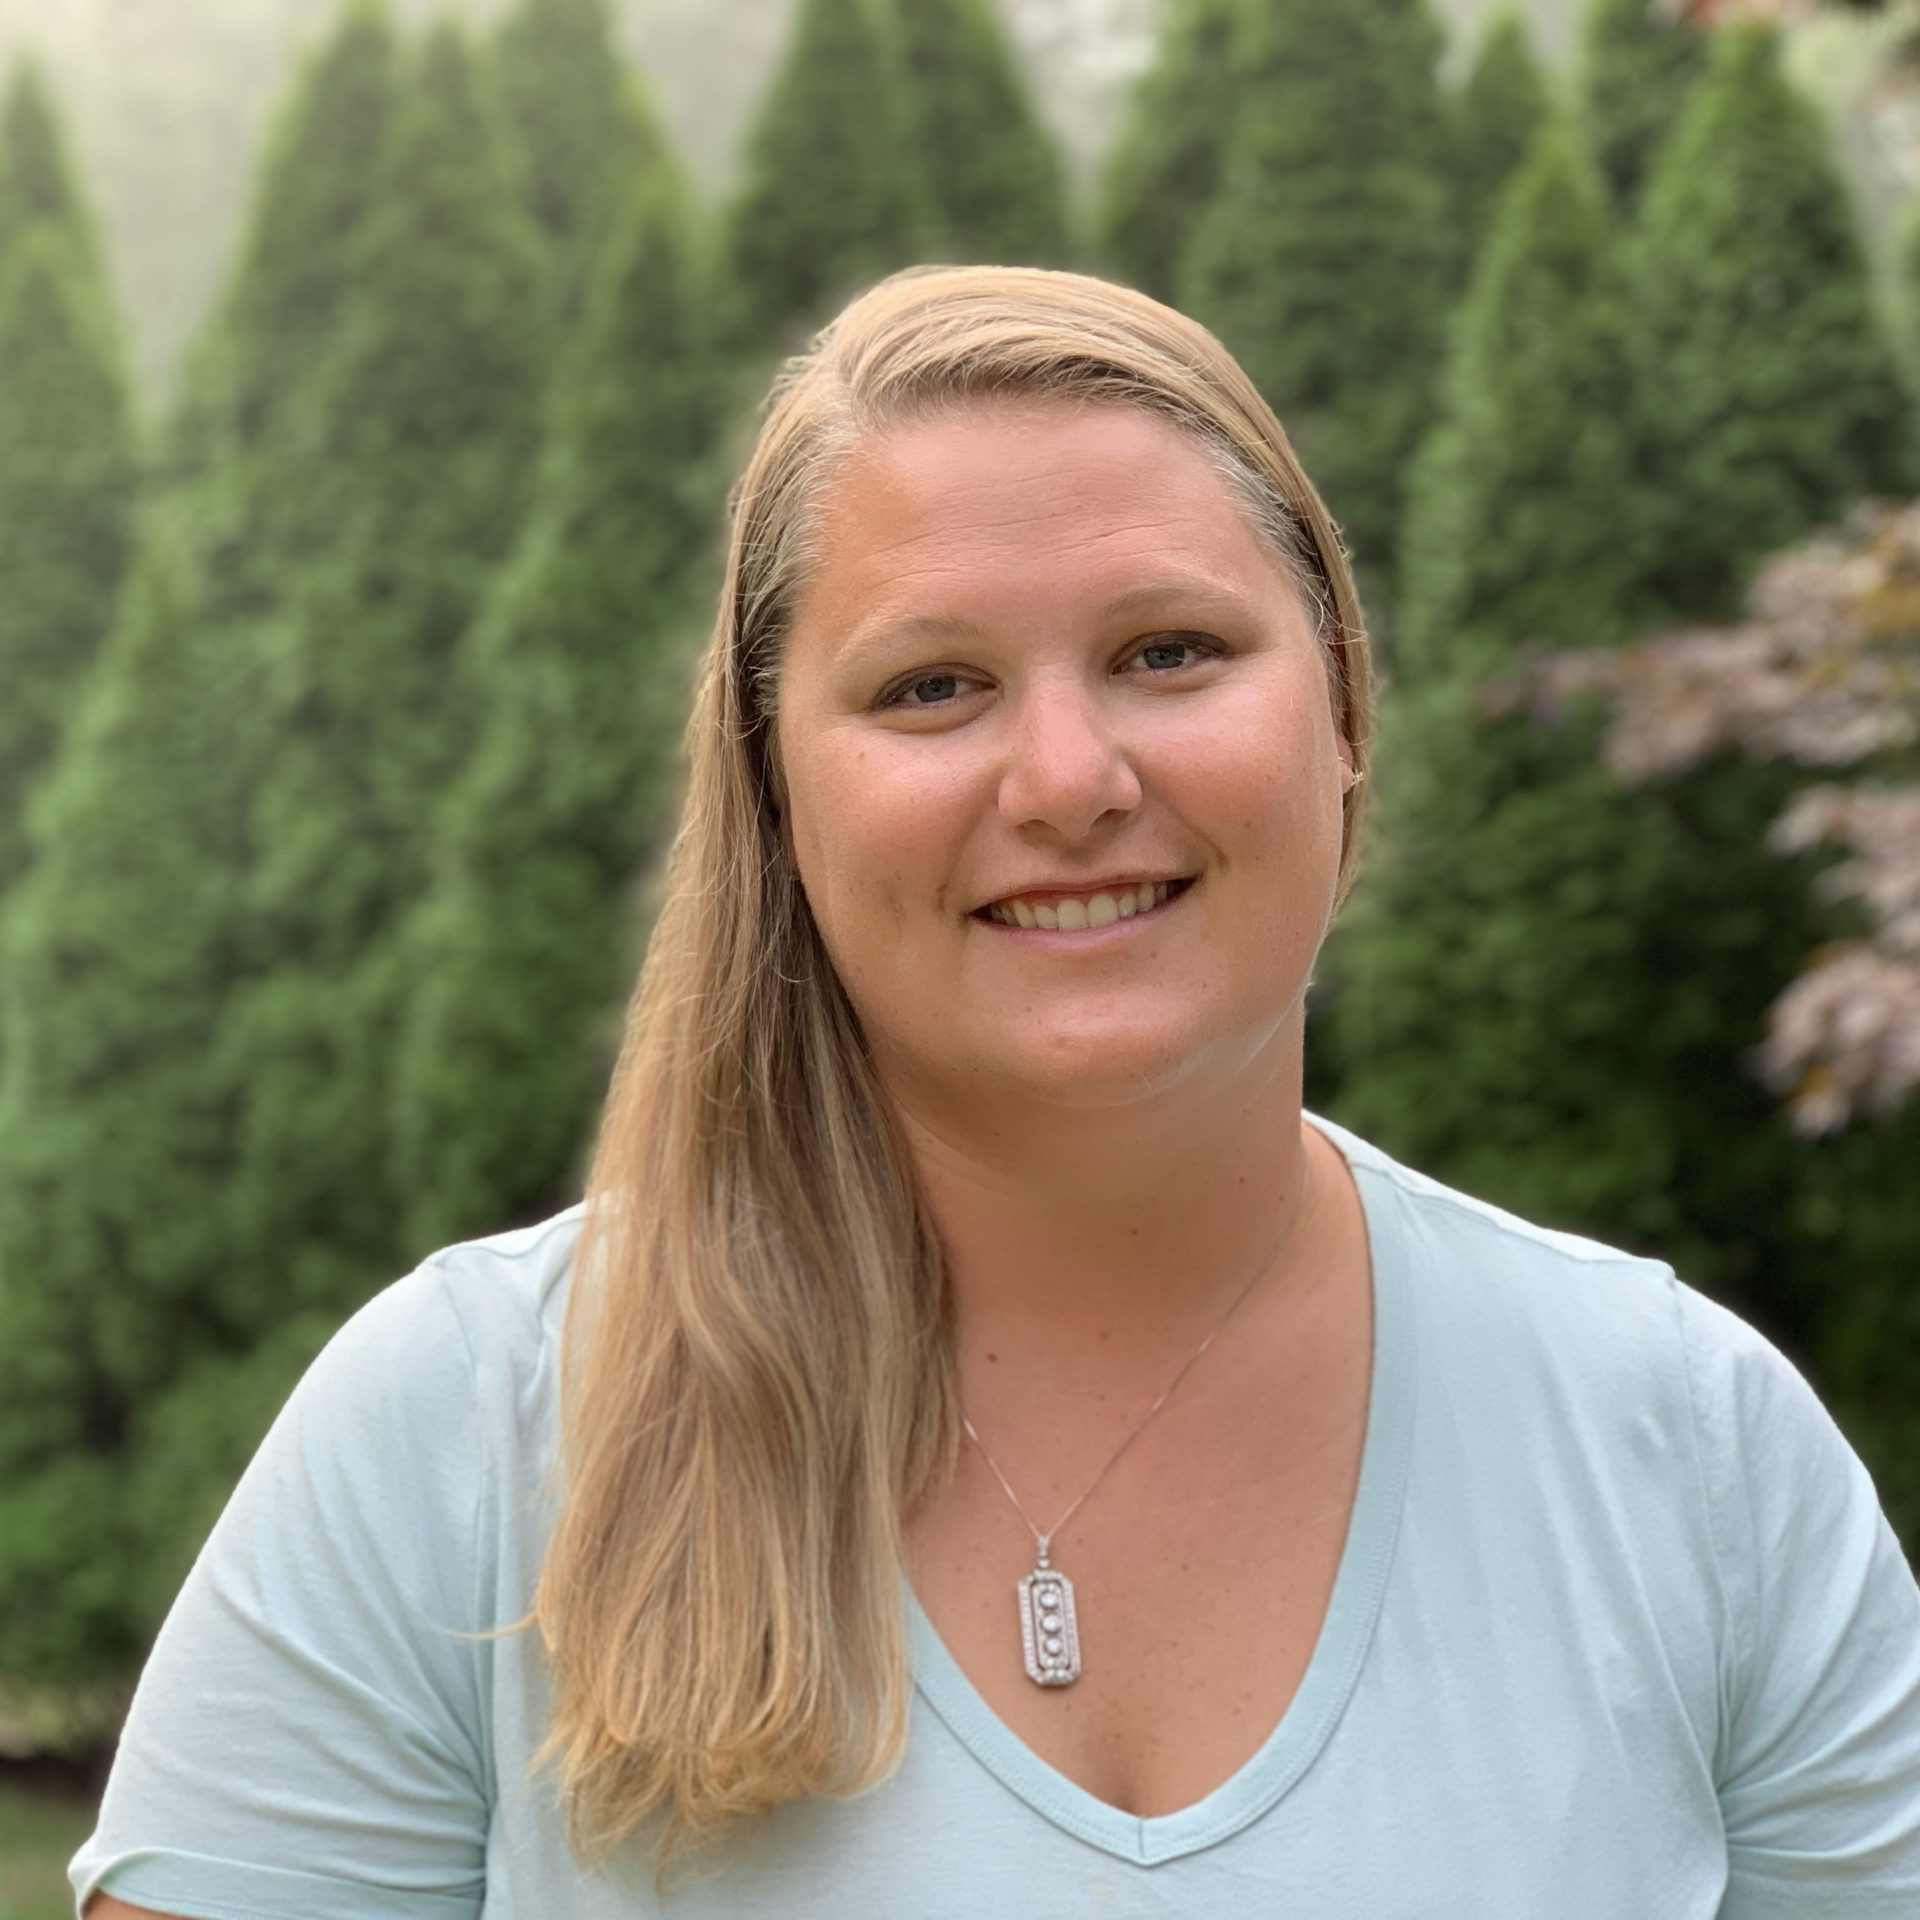 Headshot of Kathryn Baltes